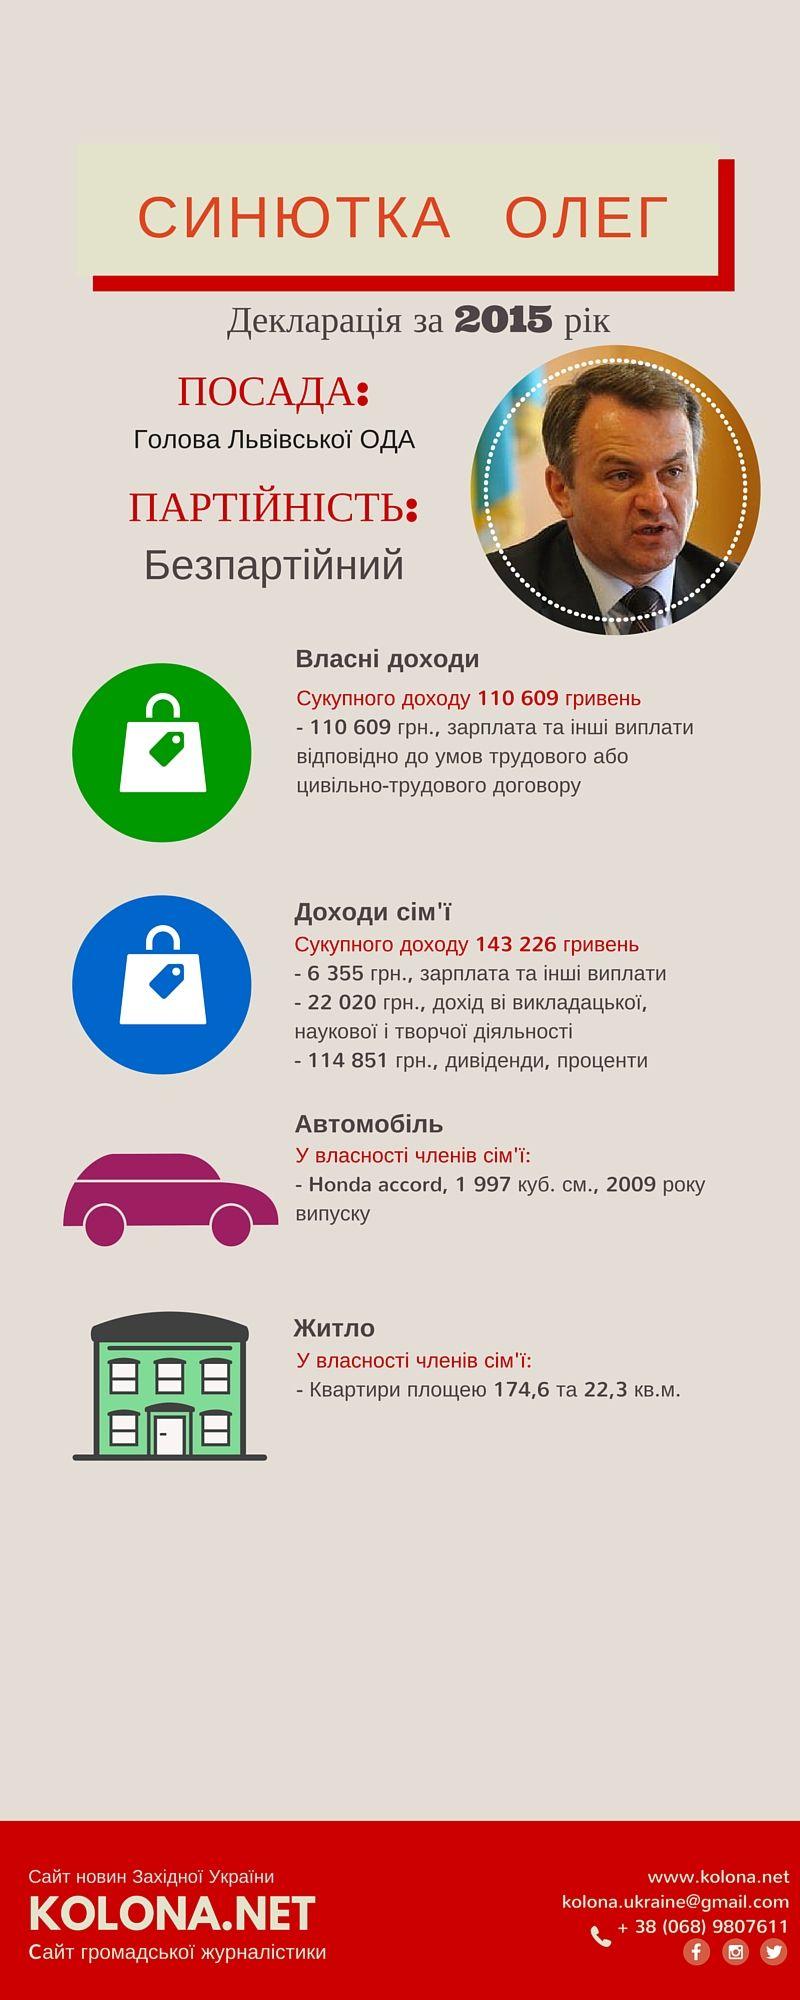 Copy of Copy of Copy of Copy of Copy of Copy of Copy of Copy of Copy of Декларація депутатів